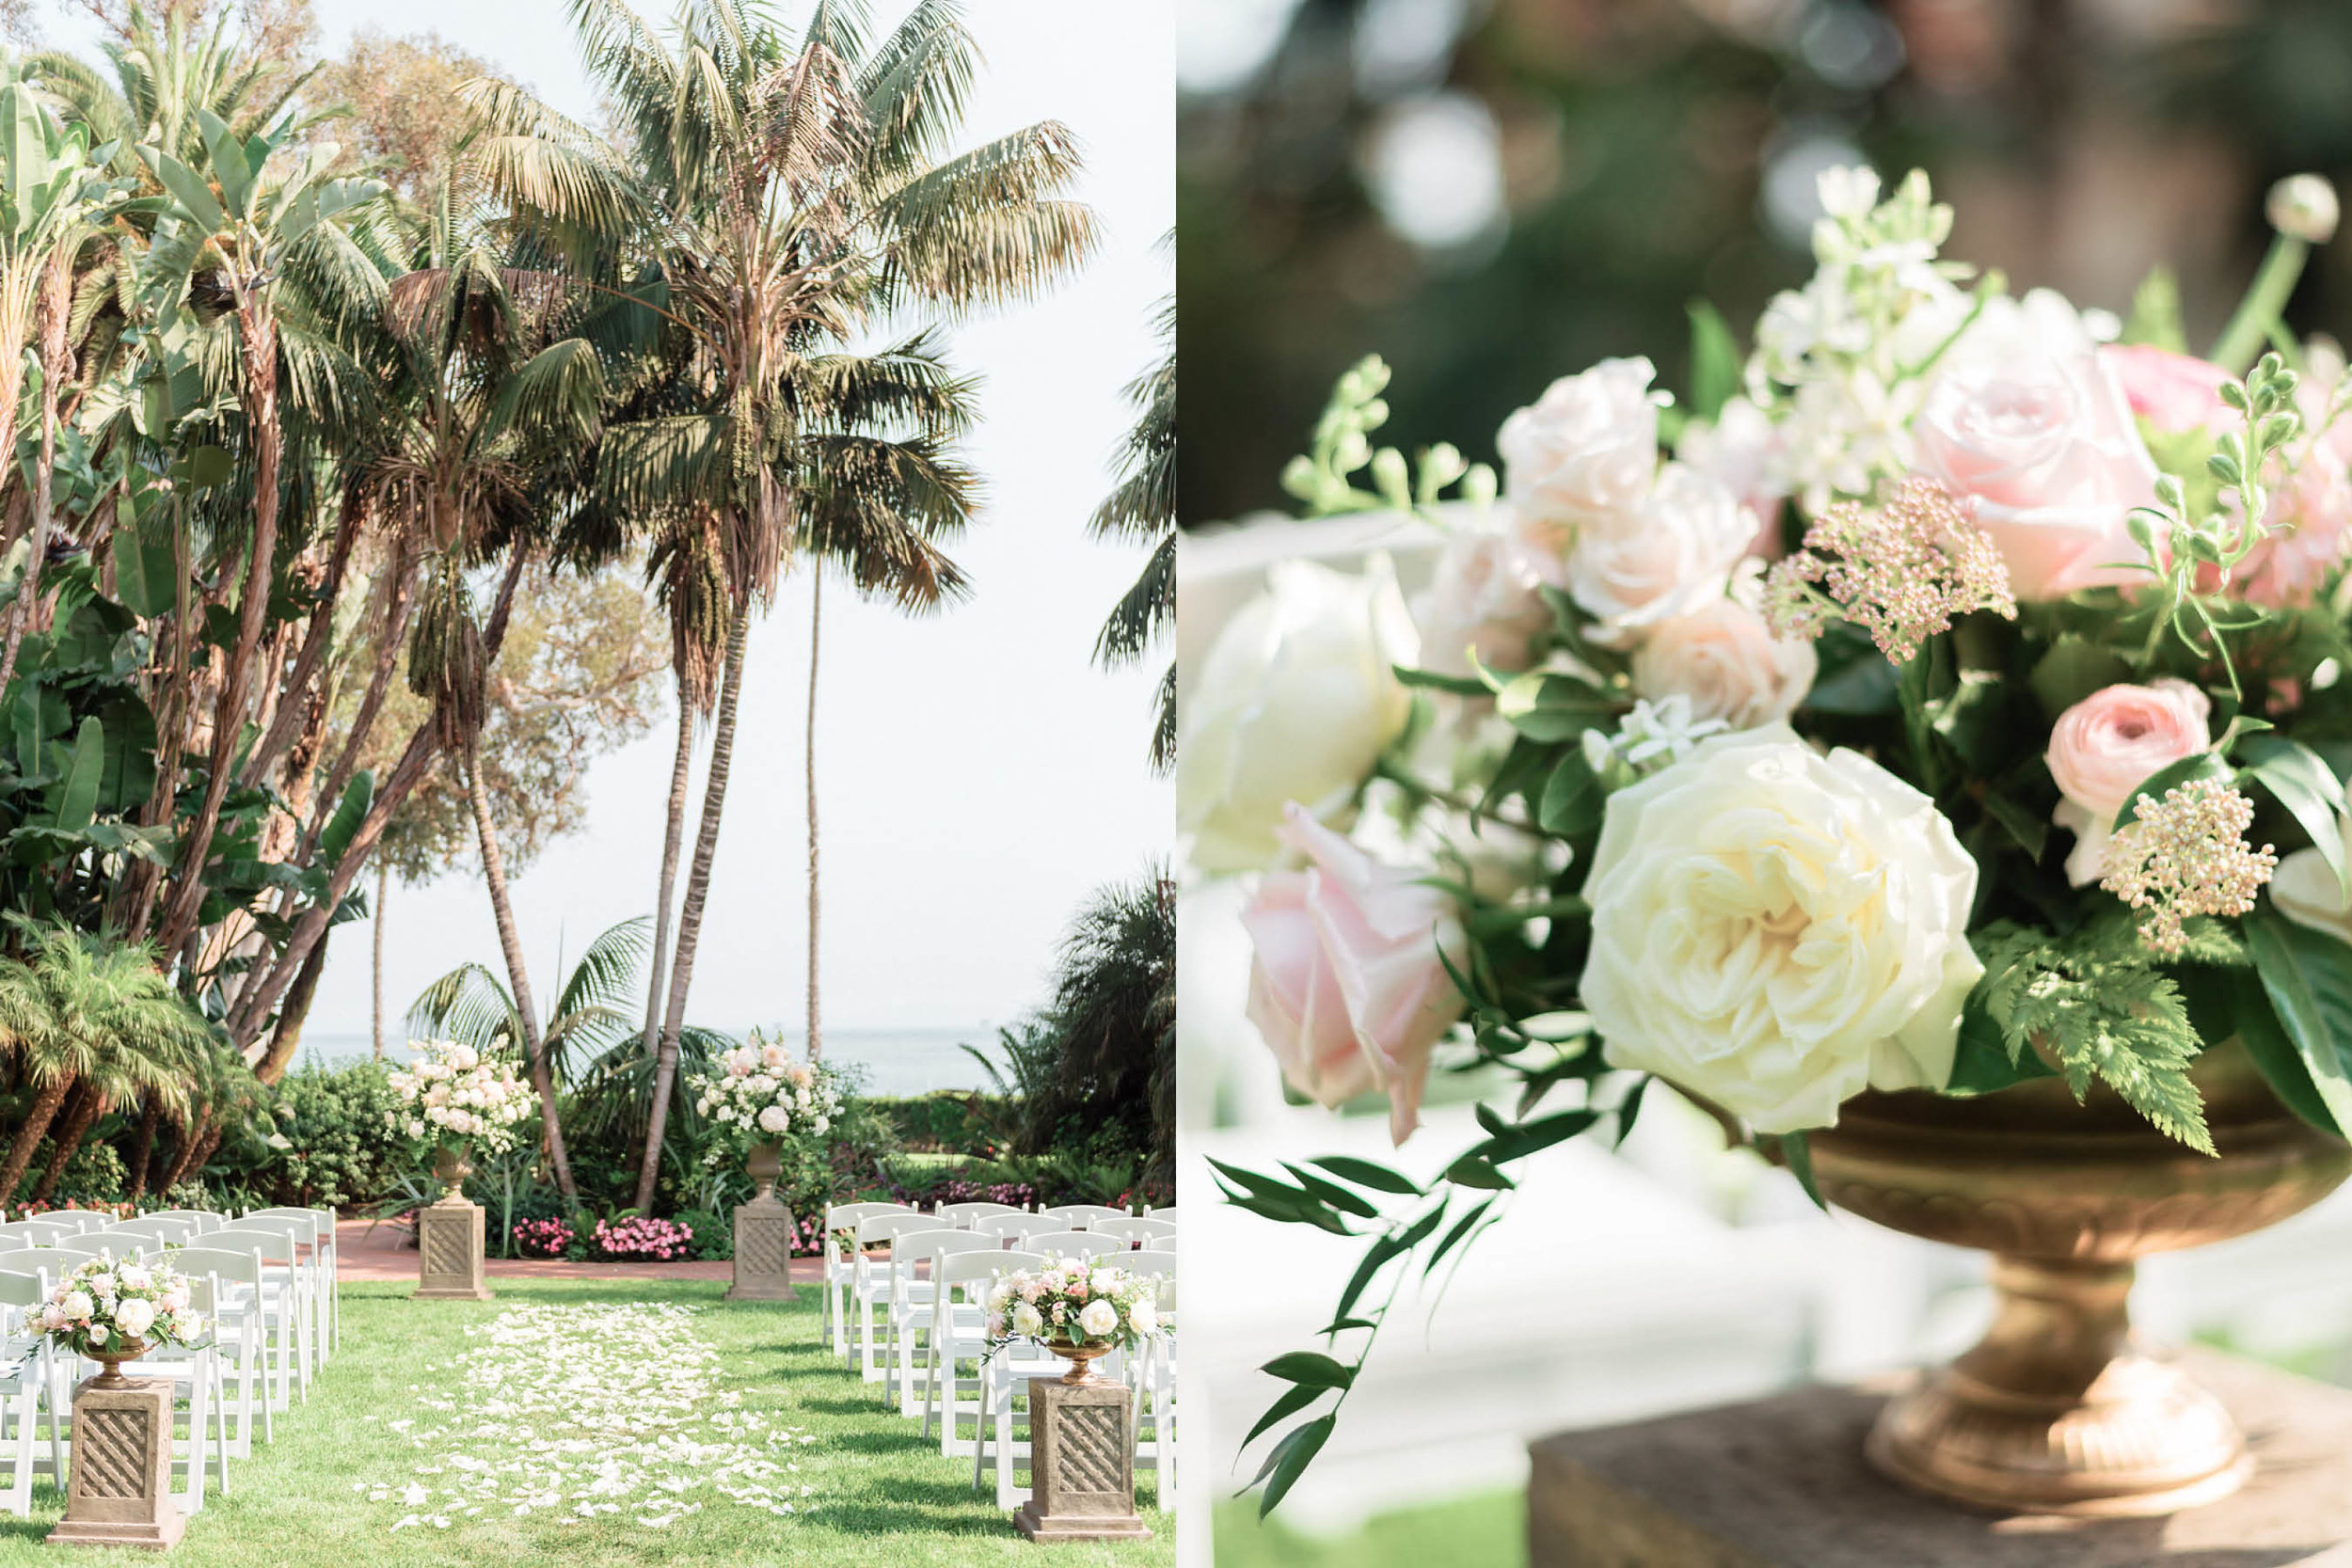 santa-barbara-elopement-elope-wedding-planner-coordinator-day-of-four-seasons-biltmore-ocean-front-view-garden-pink-white-green-montecito-black-tie (11).jpg